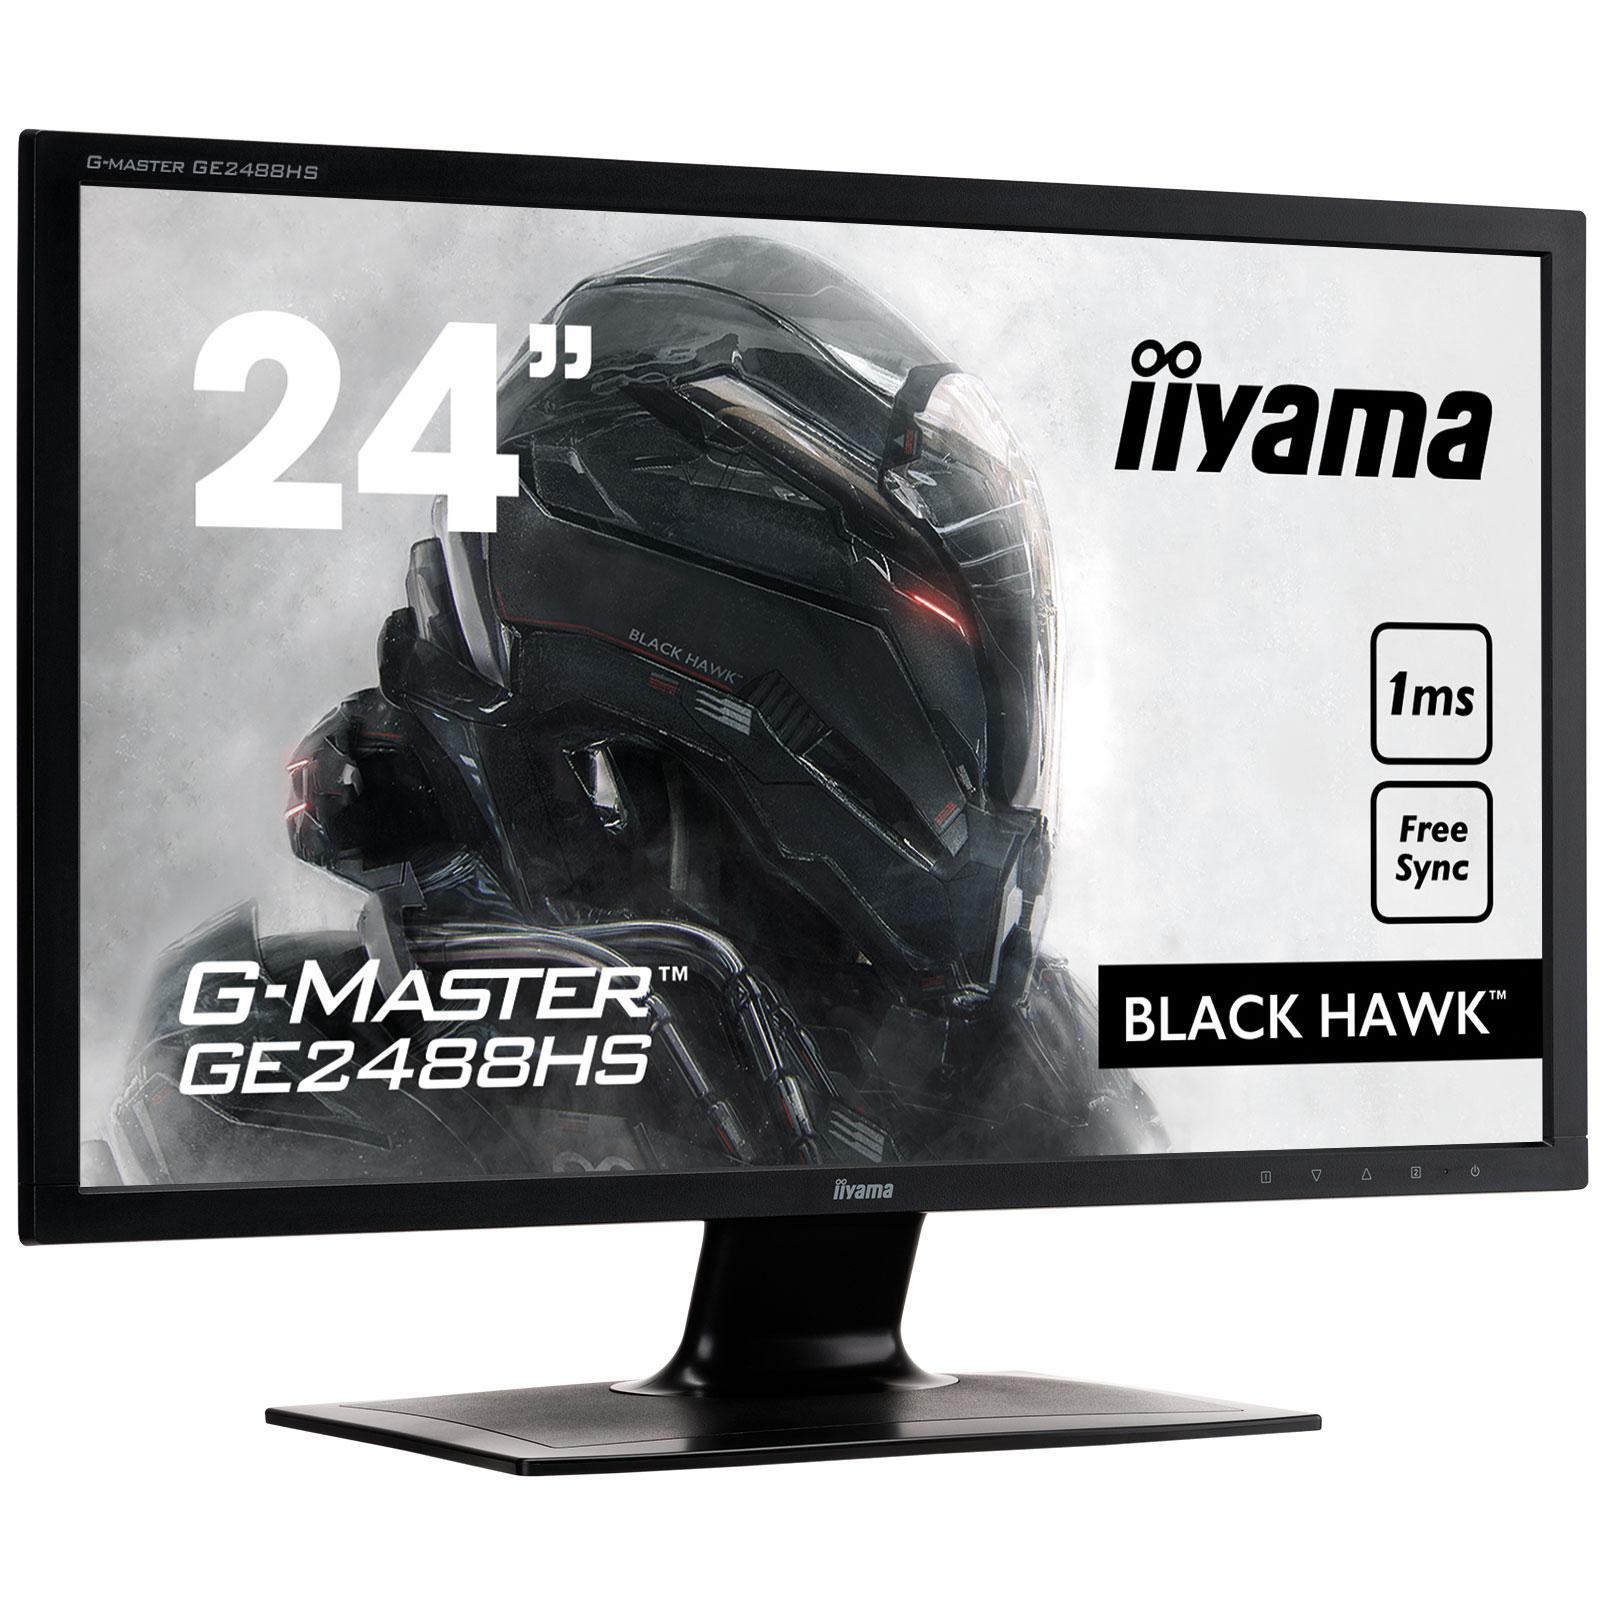 iiyama 24 led g master ge2488hs b2 black hawk ecran. Black Bedroom Furniture Sets. Home Design Ideas